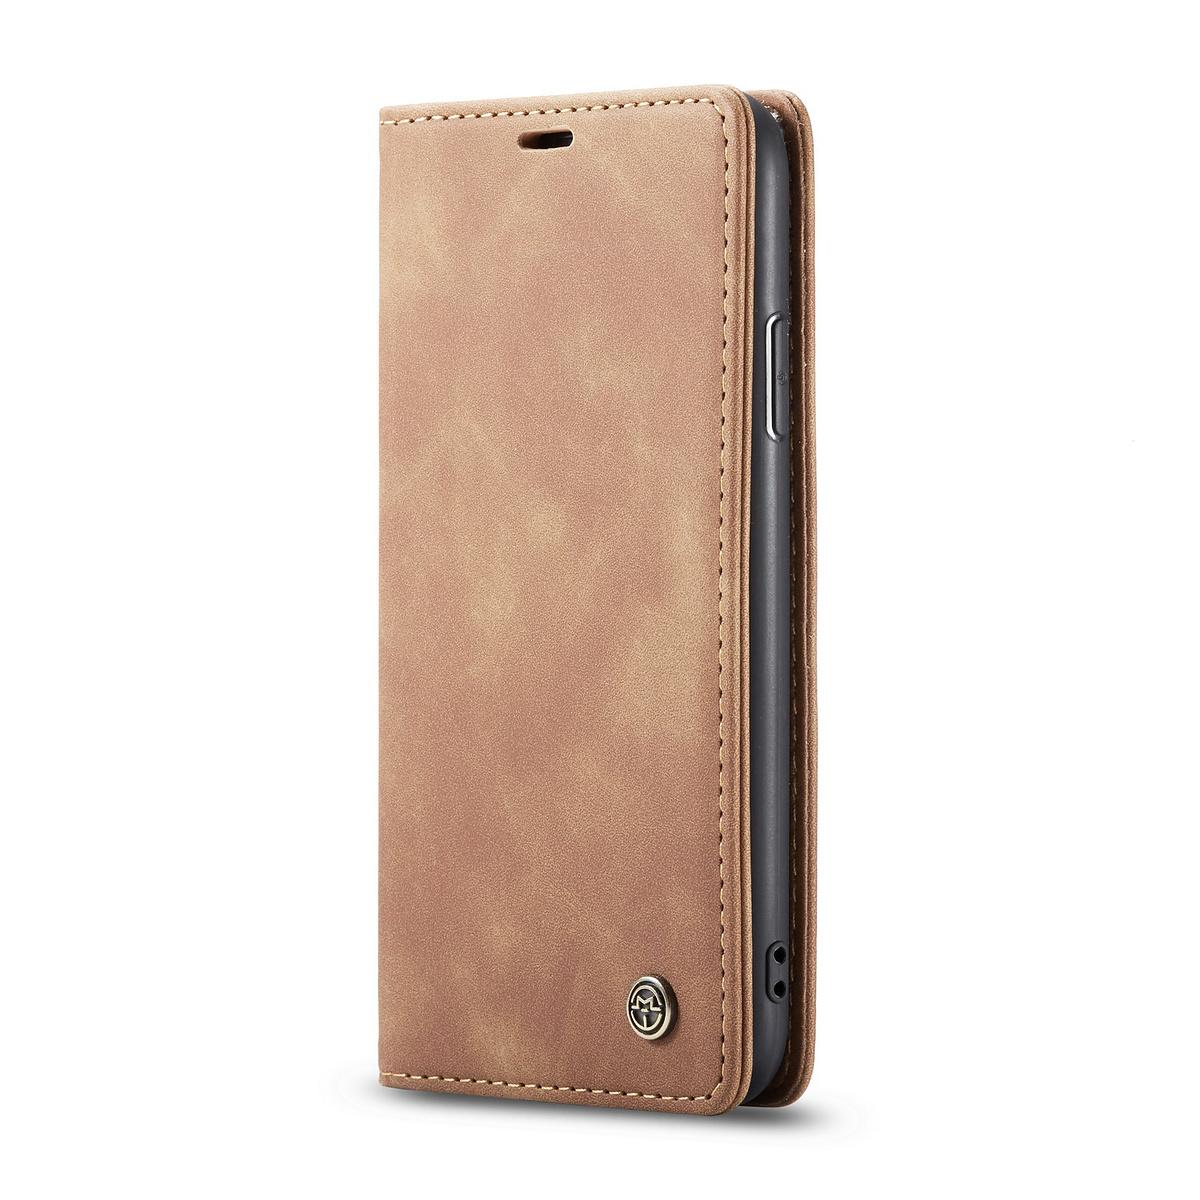 CaseMe plånboksfodral, iPhone 11, brun